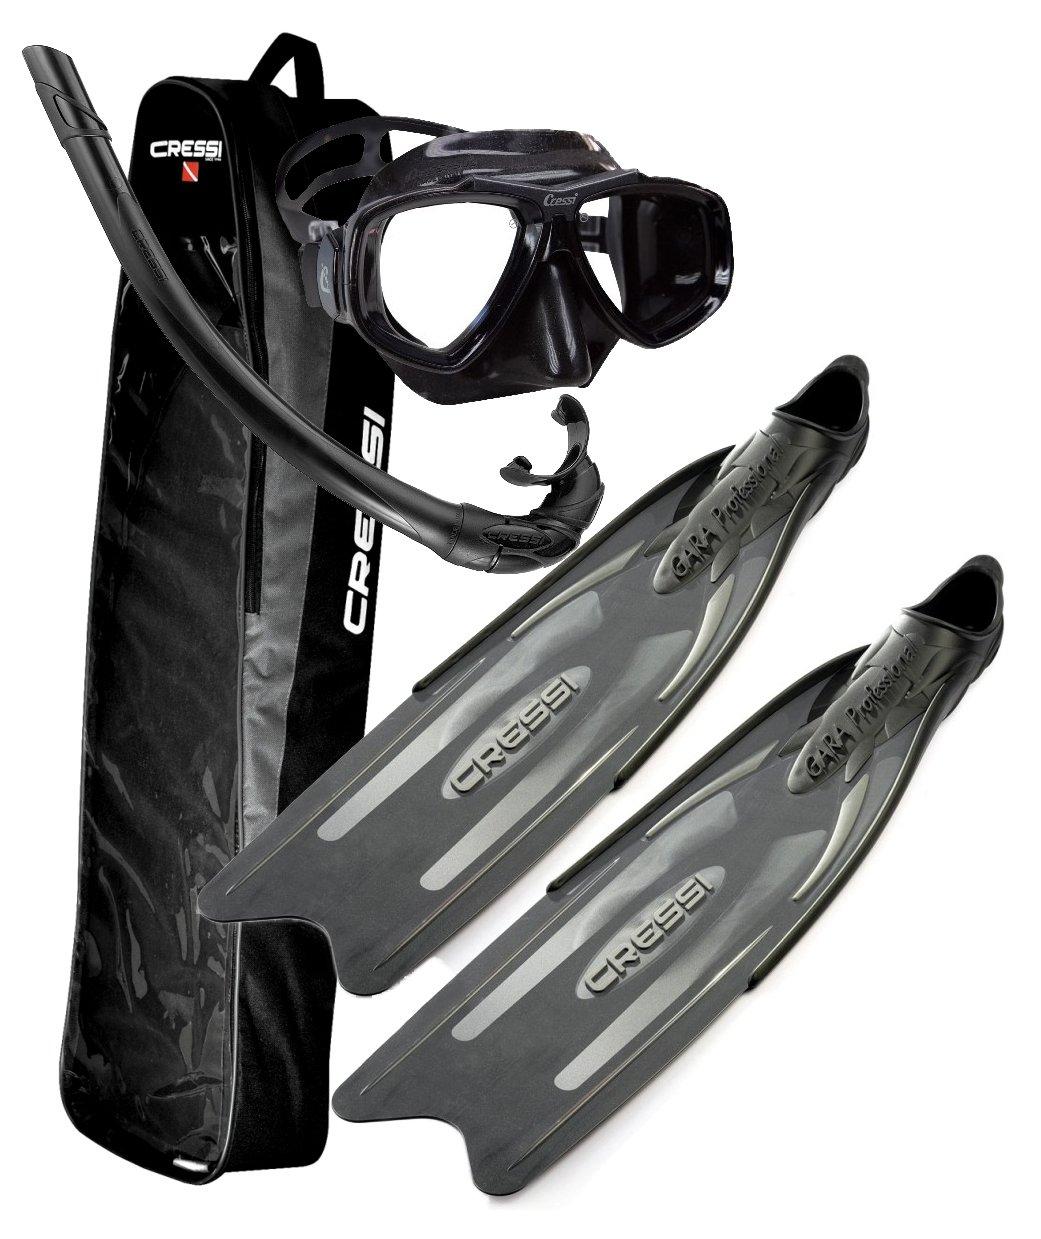 Cressi-Gara-Professional-Fins-Freediving-Spearfishing-Mask-Fin-Snorkel-Set